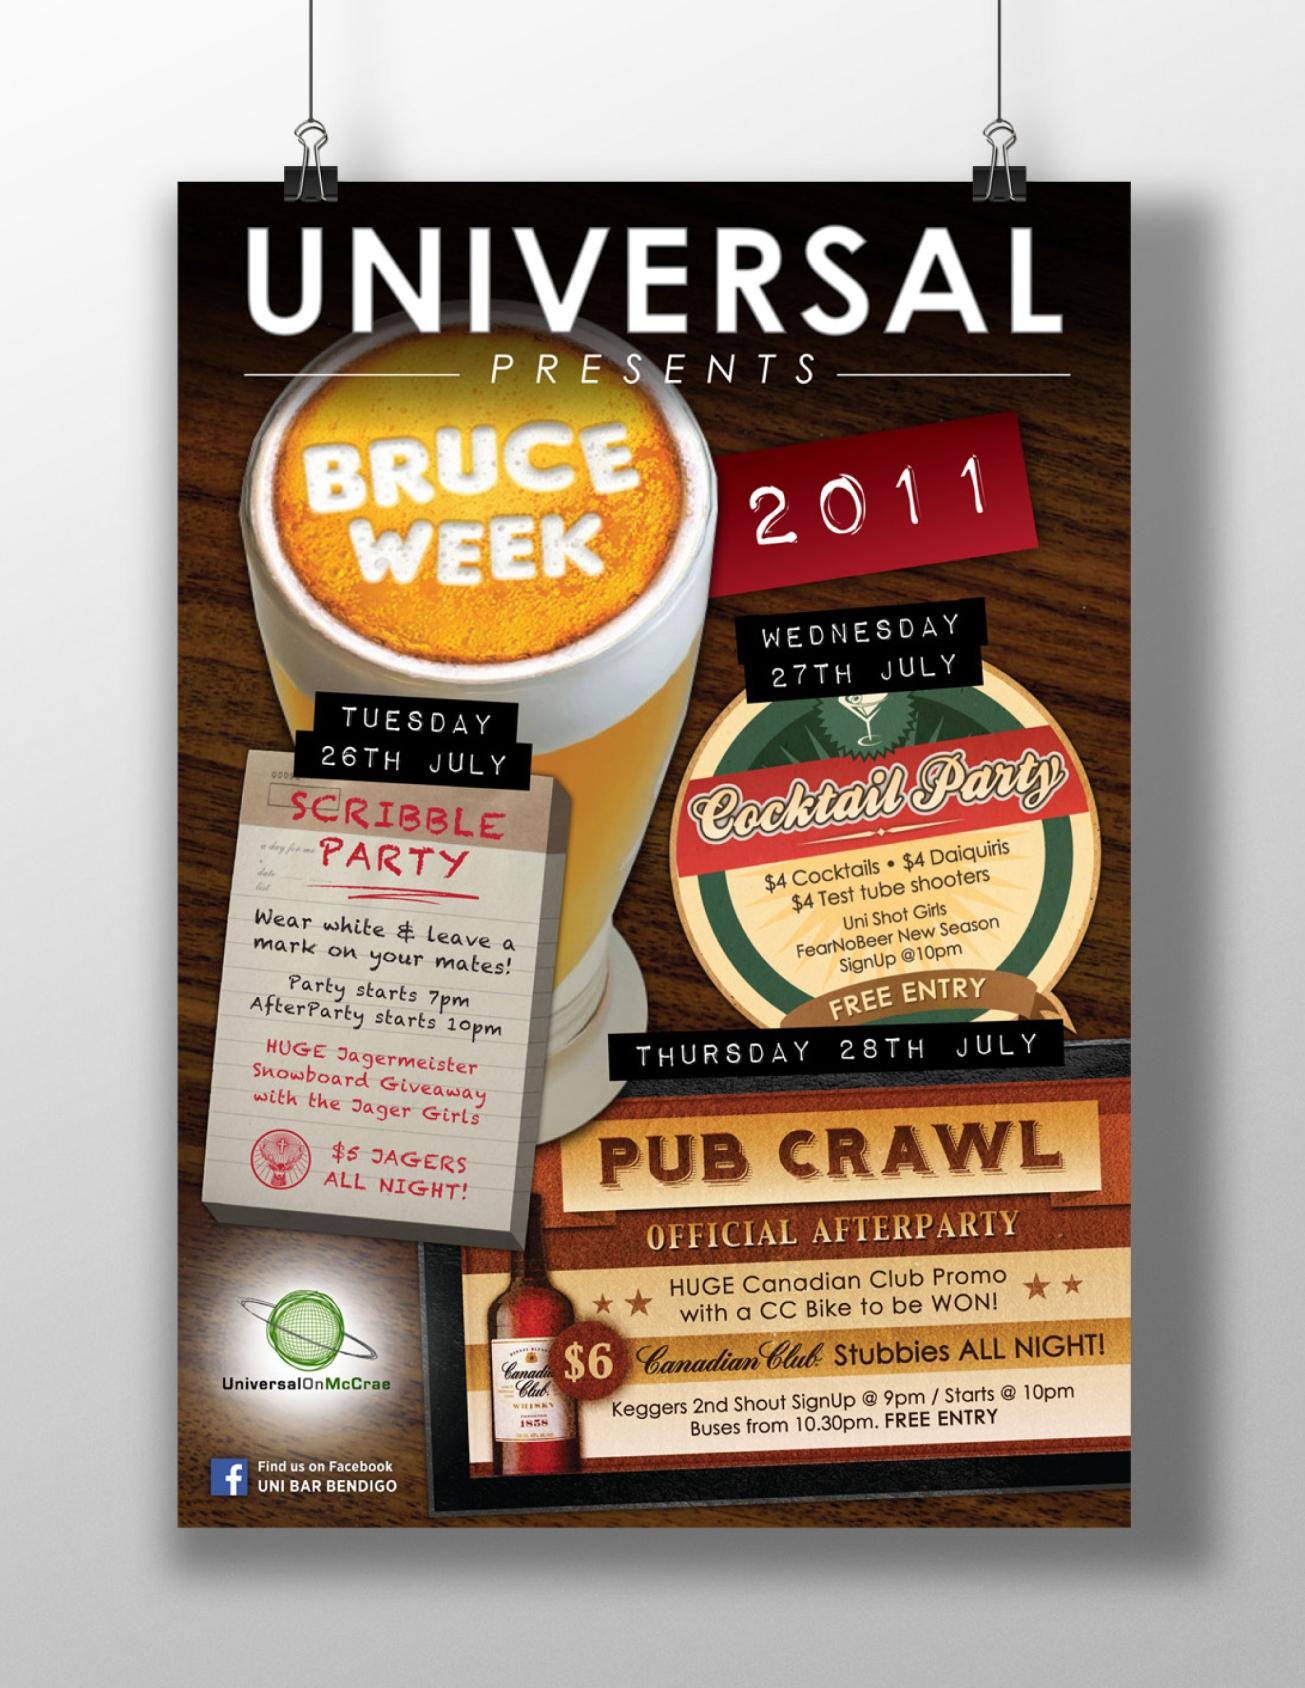 Universal_Nightclub_05